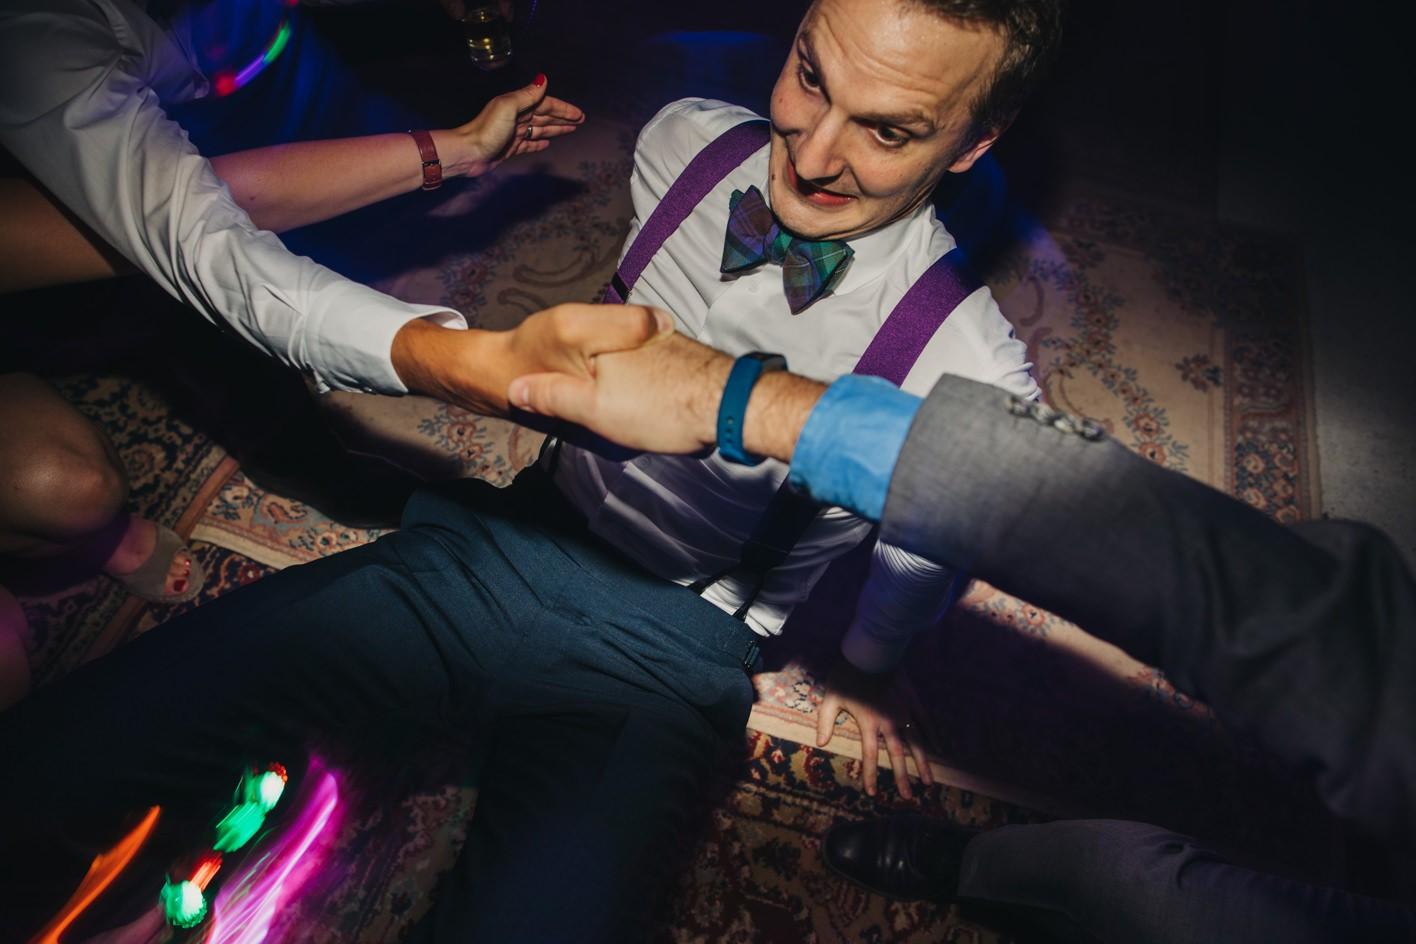 guest limbo on the dancefloor